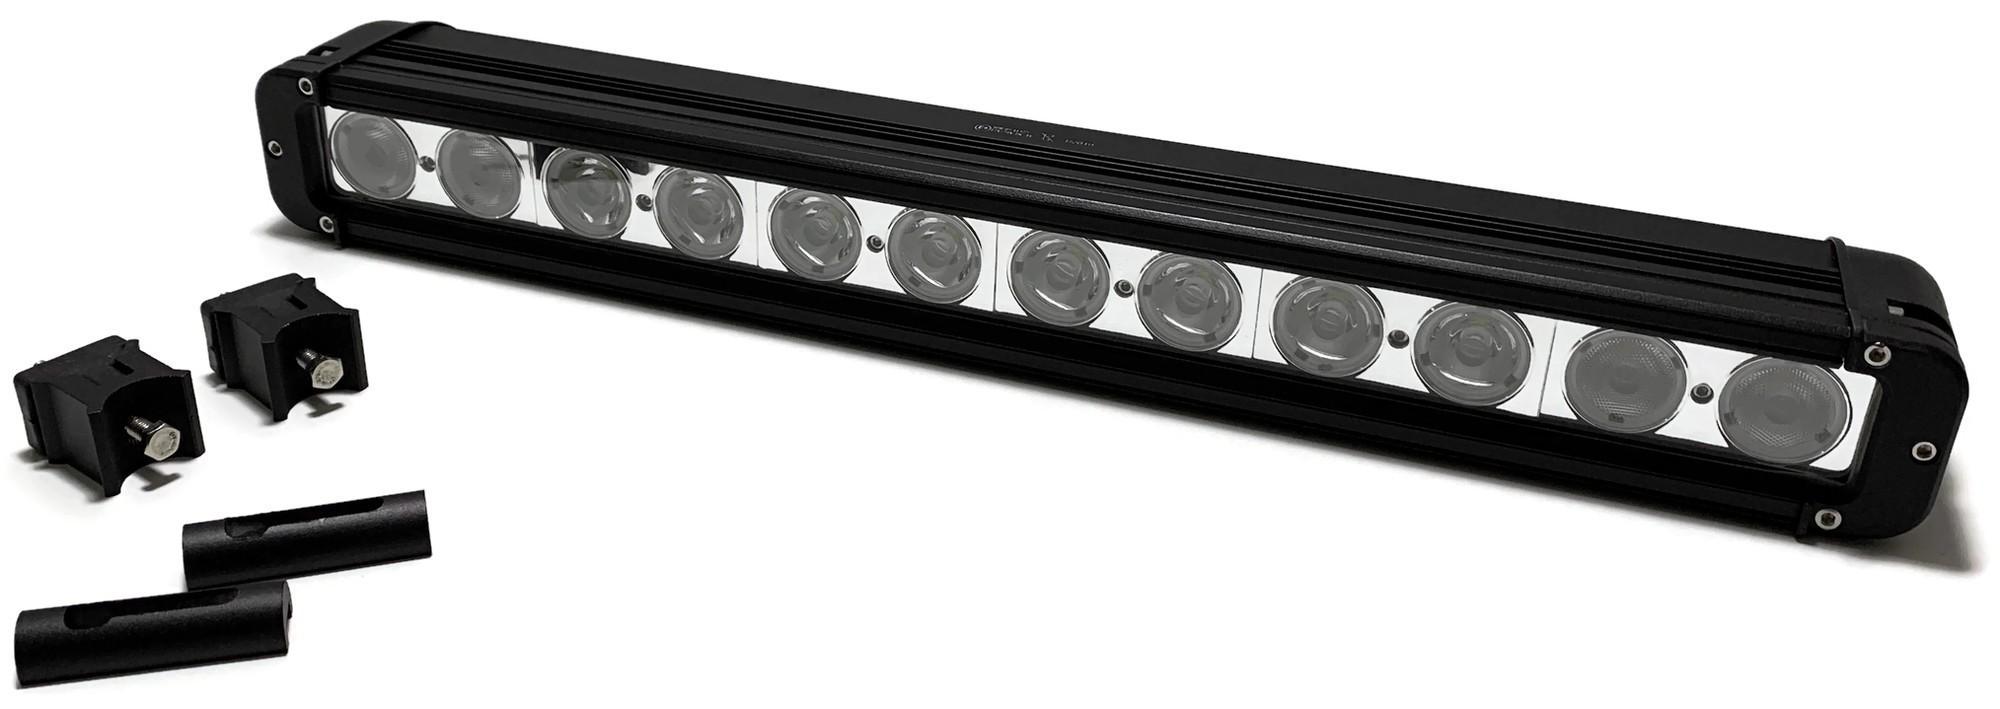 LAMPA 12 LED 120W PASEK LIGHTBAR CREE MOCNY 12V 24V